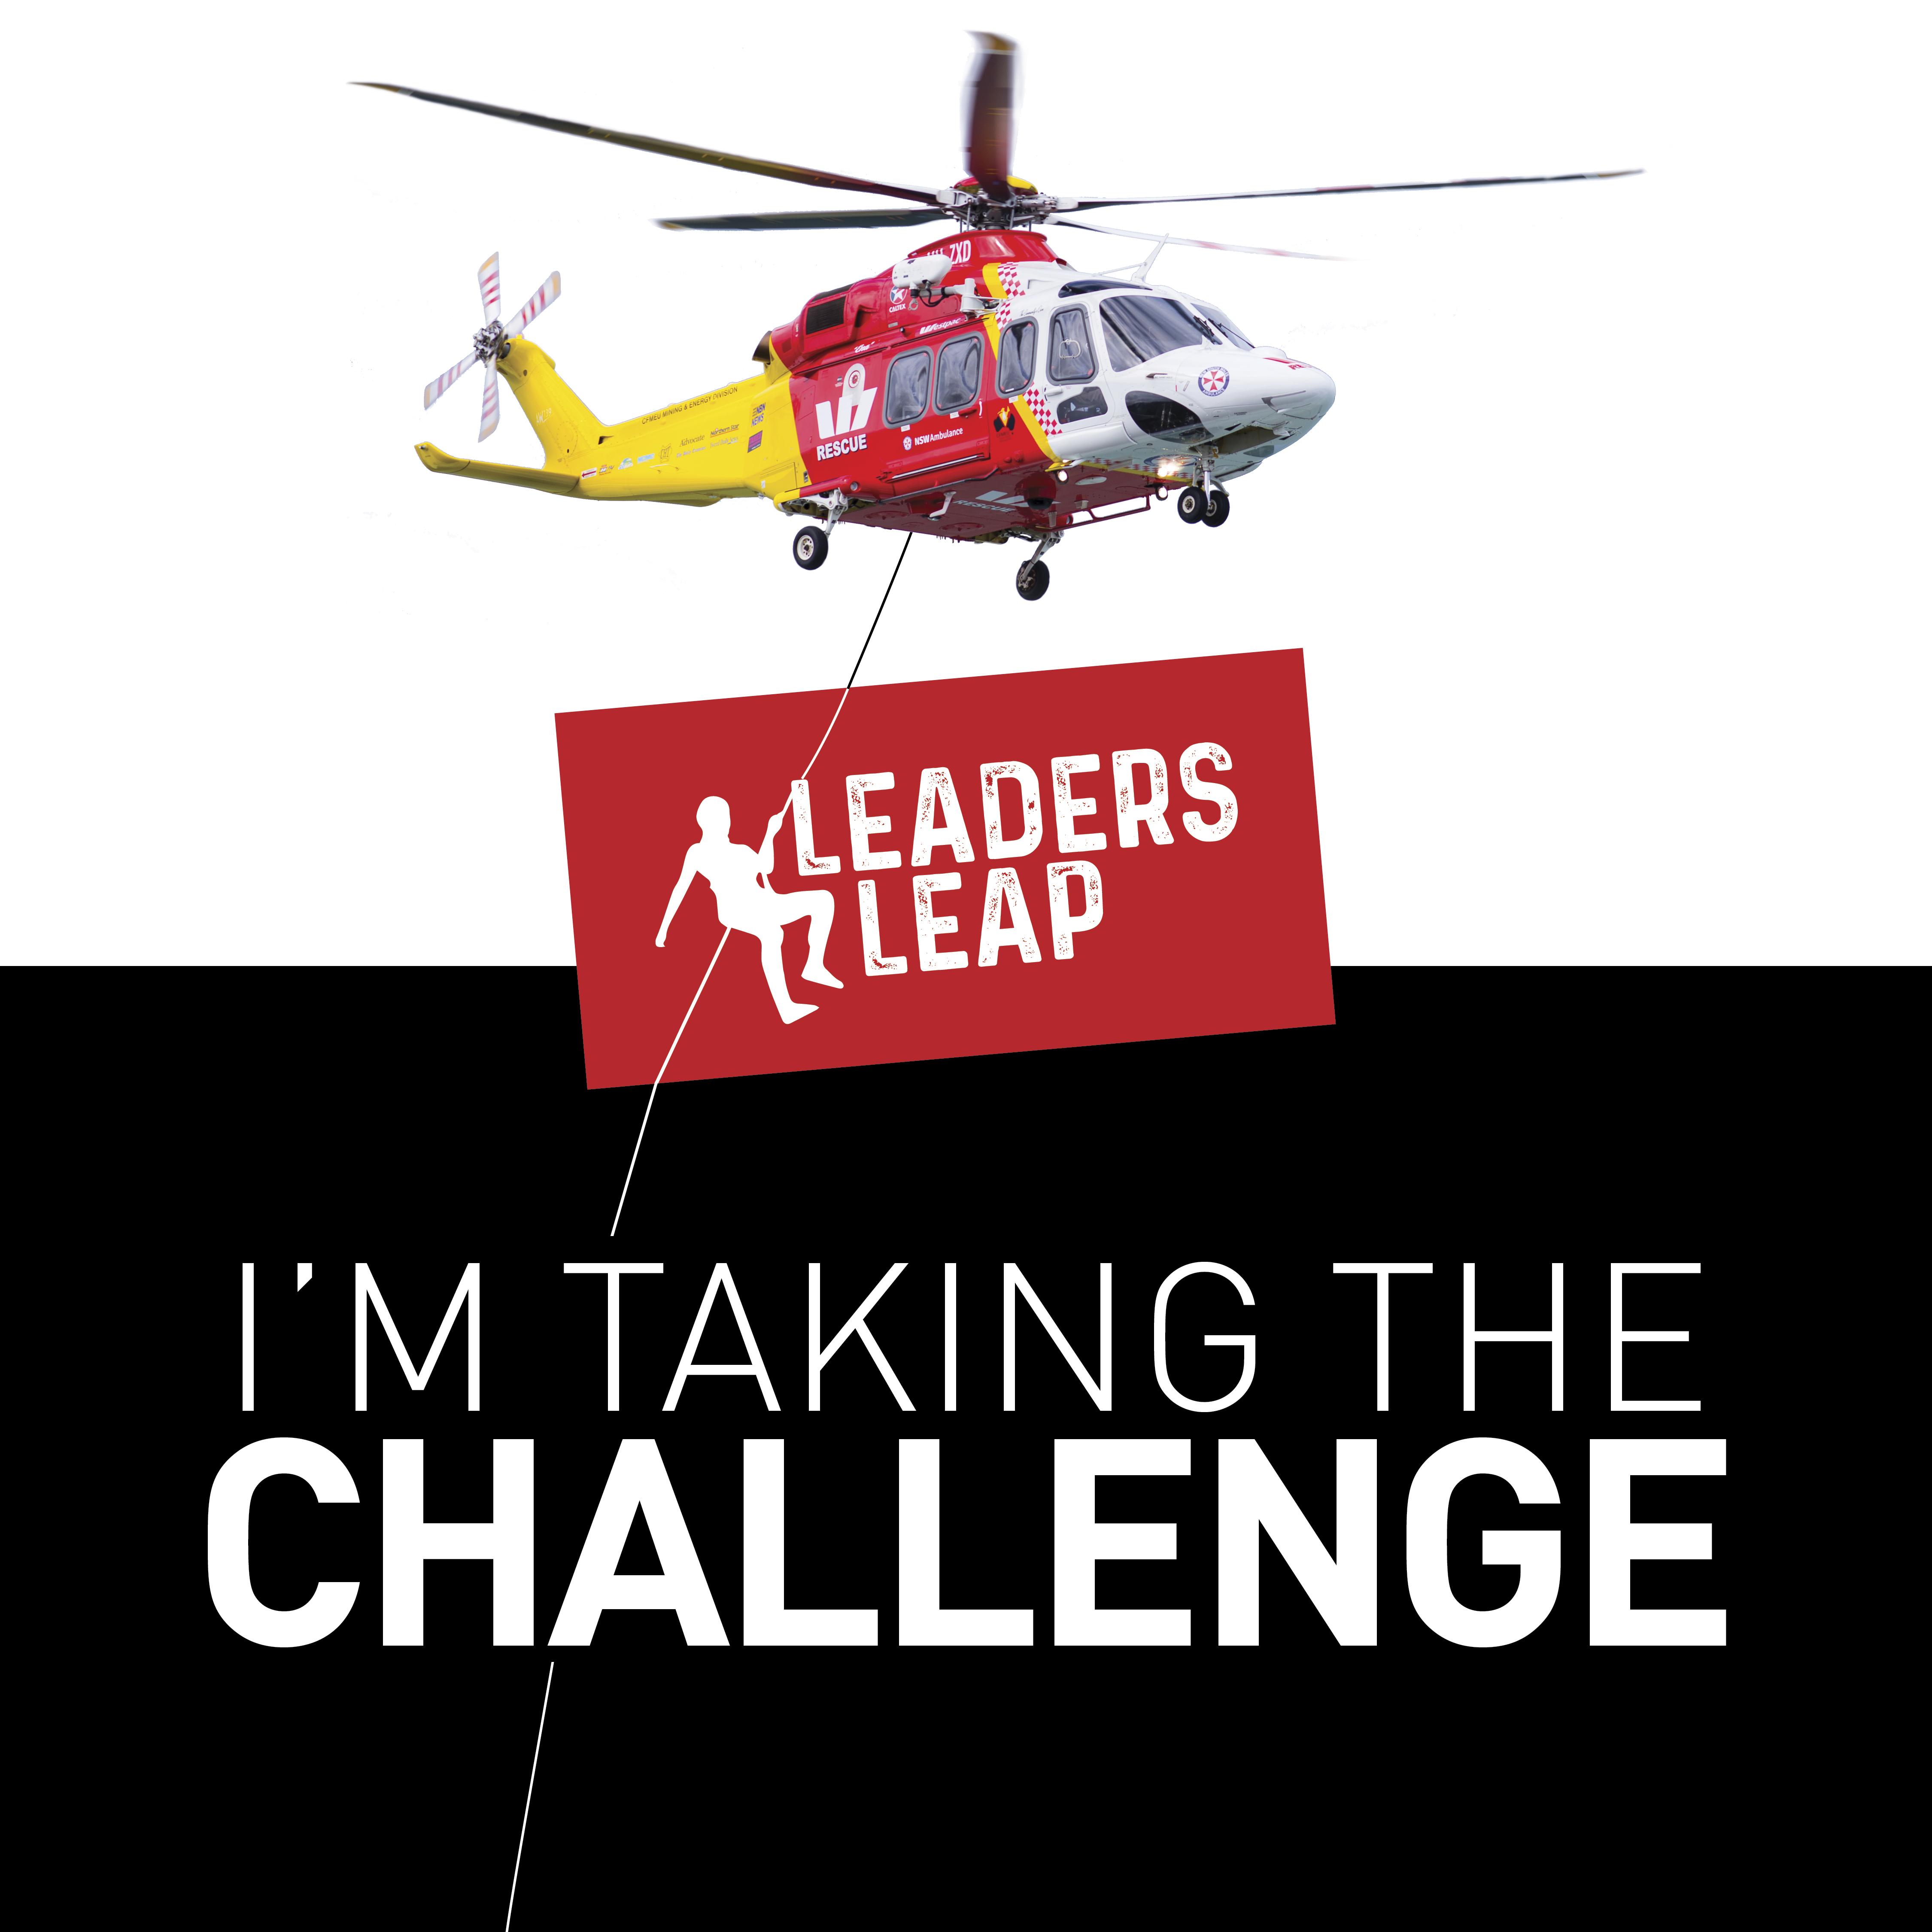 LeadersLeap Challenge AW139 Social Tile